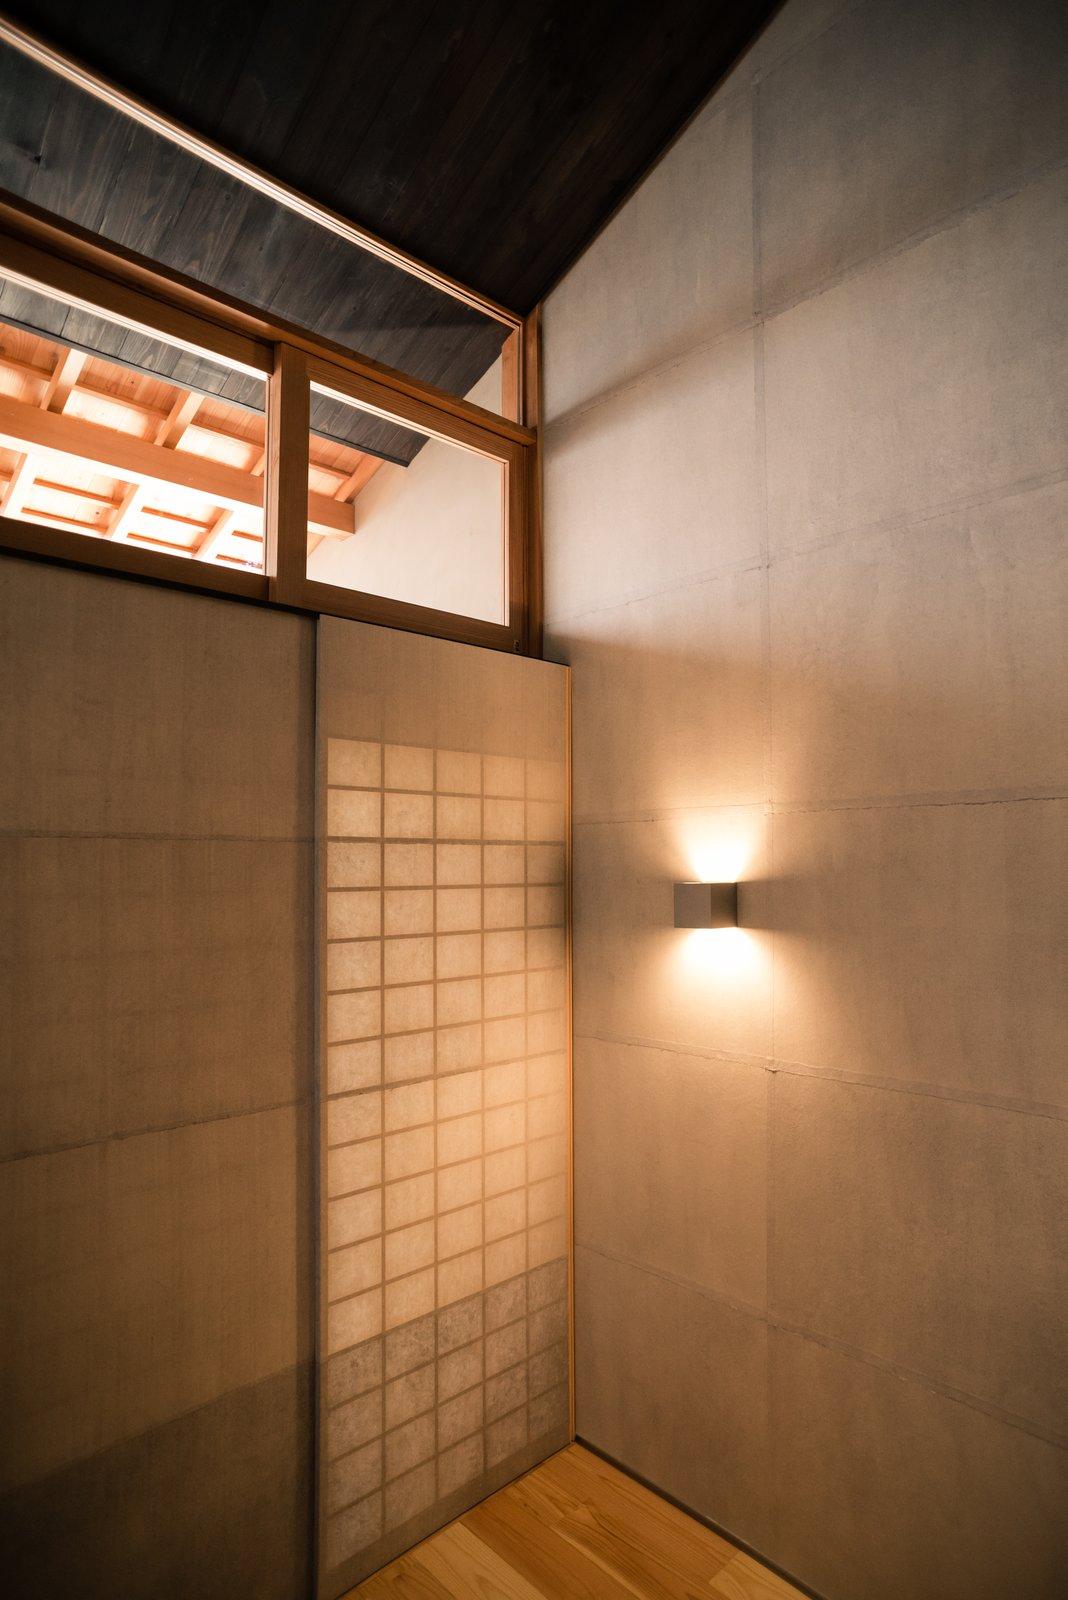 Living Room, Light Hardwood Floor, and Wall Lighting  Ichijoji House by atelier Luke